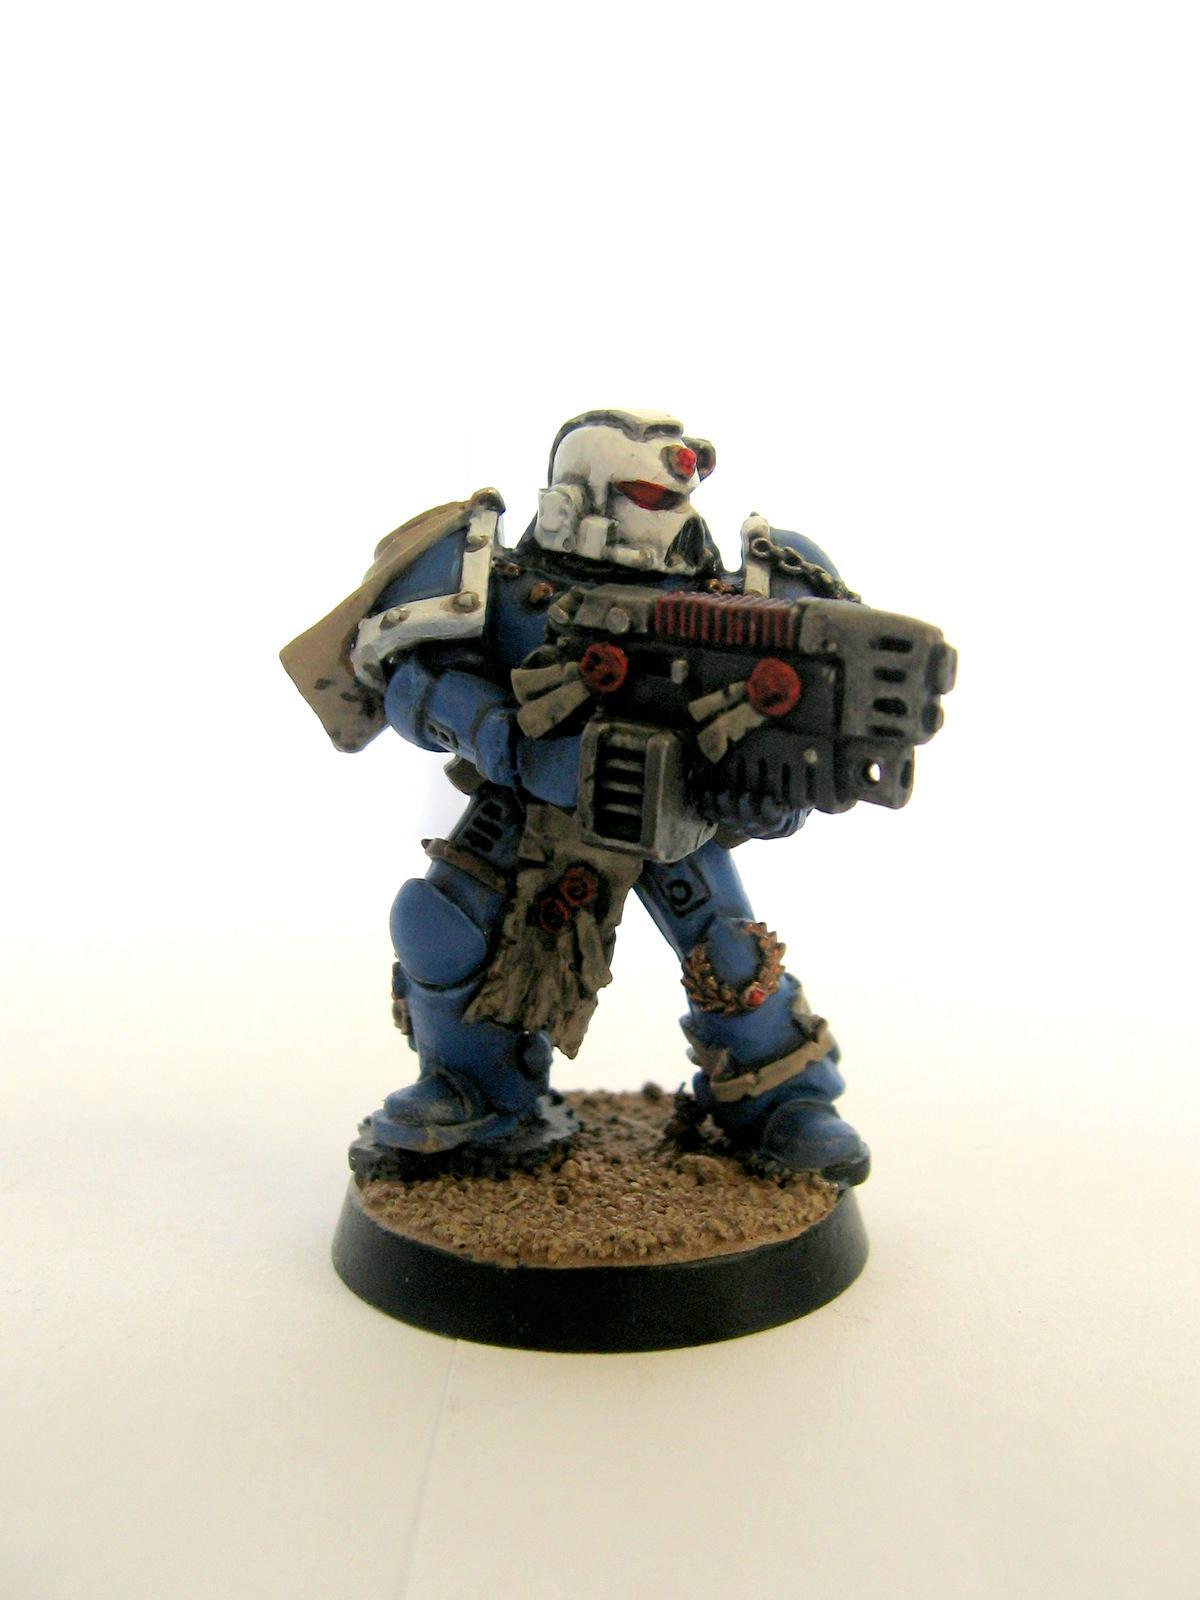 Sternguard, Ultramarines, Veteran